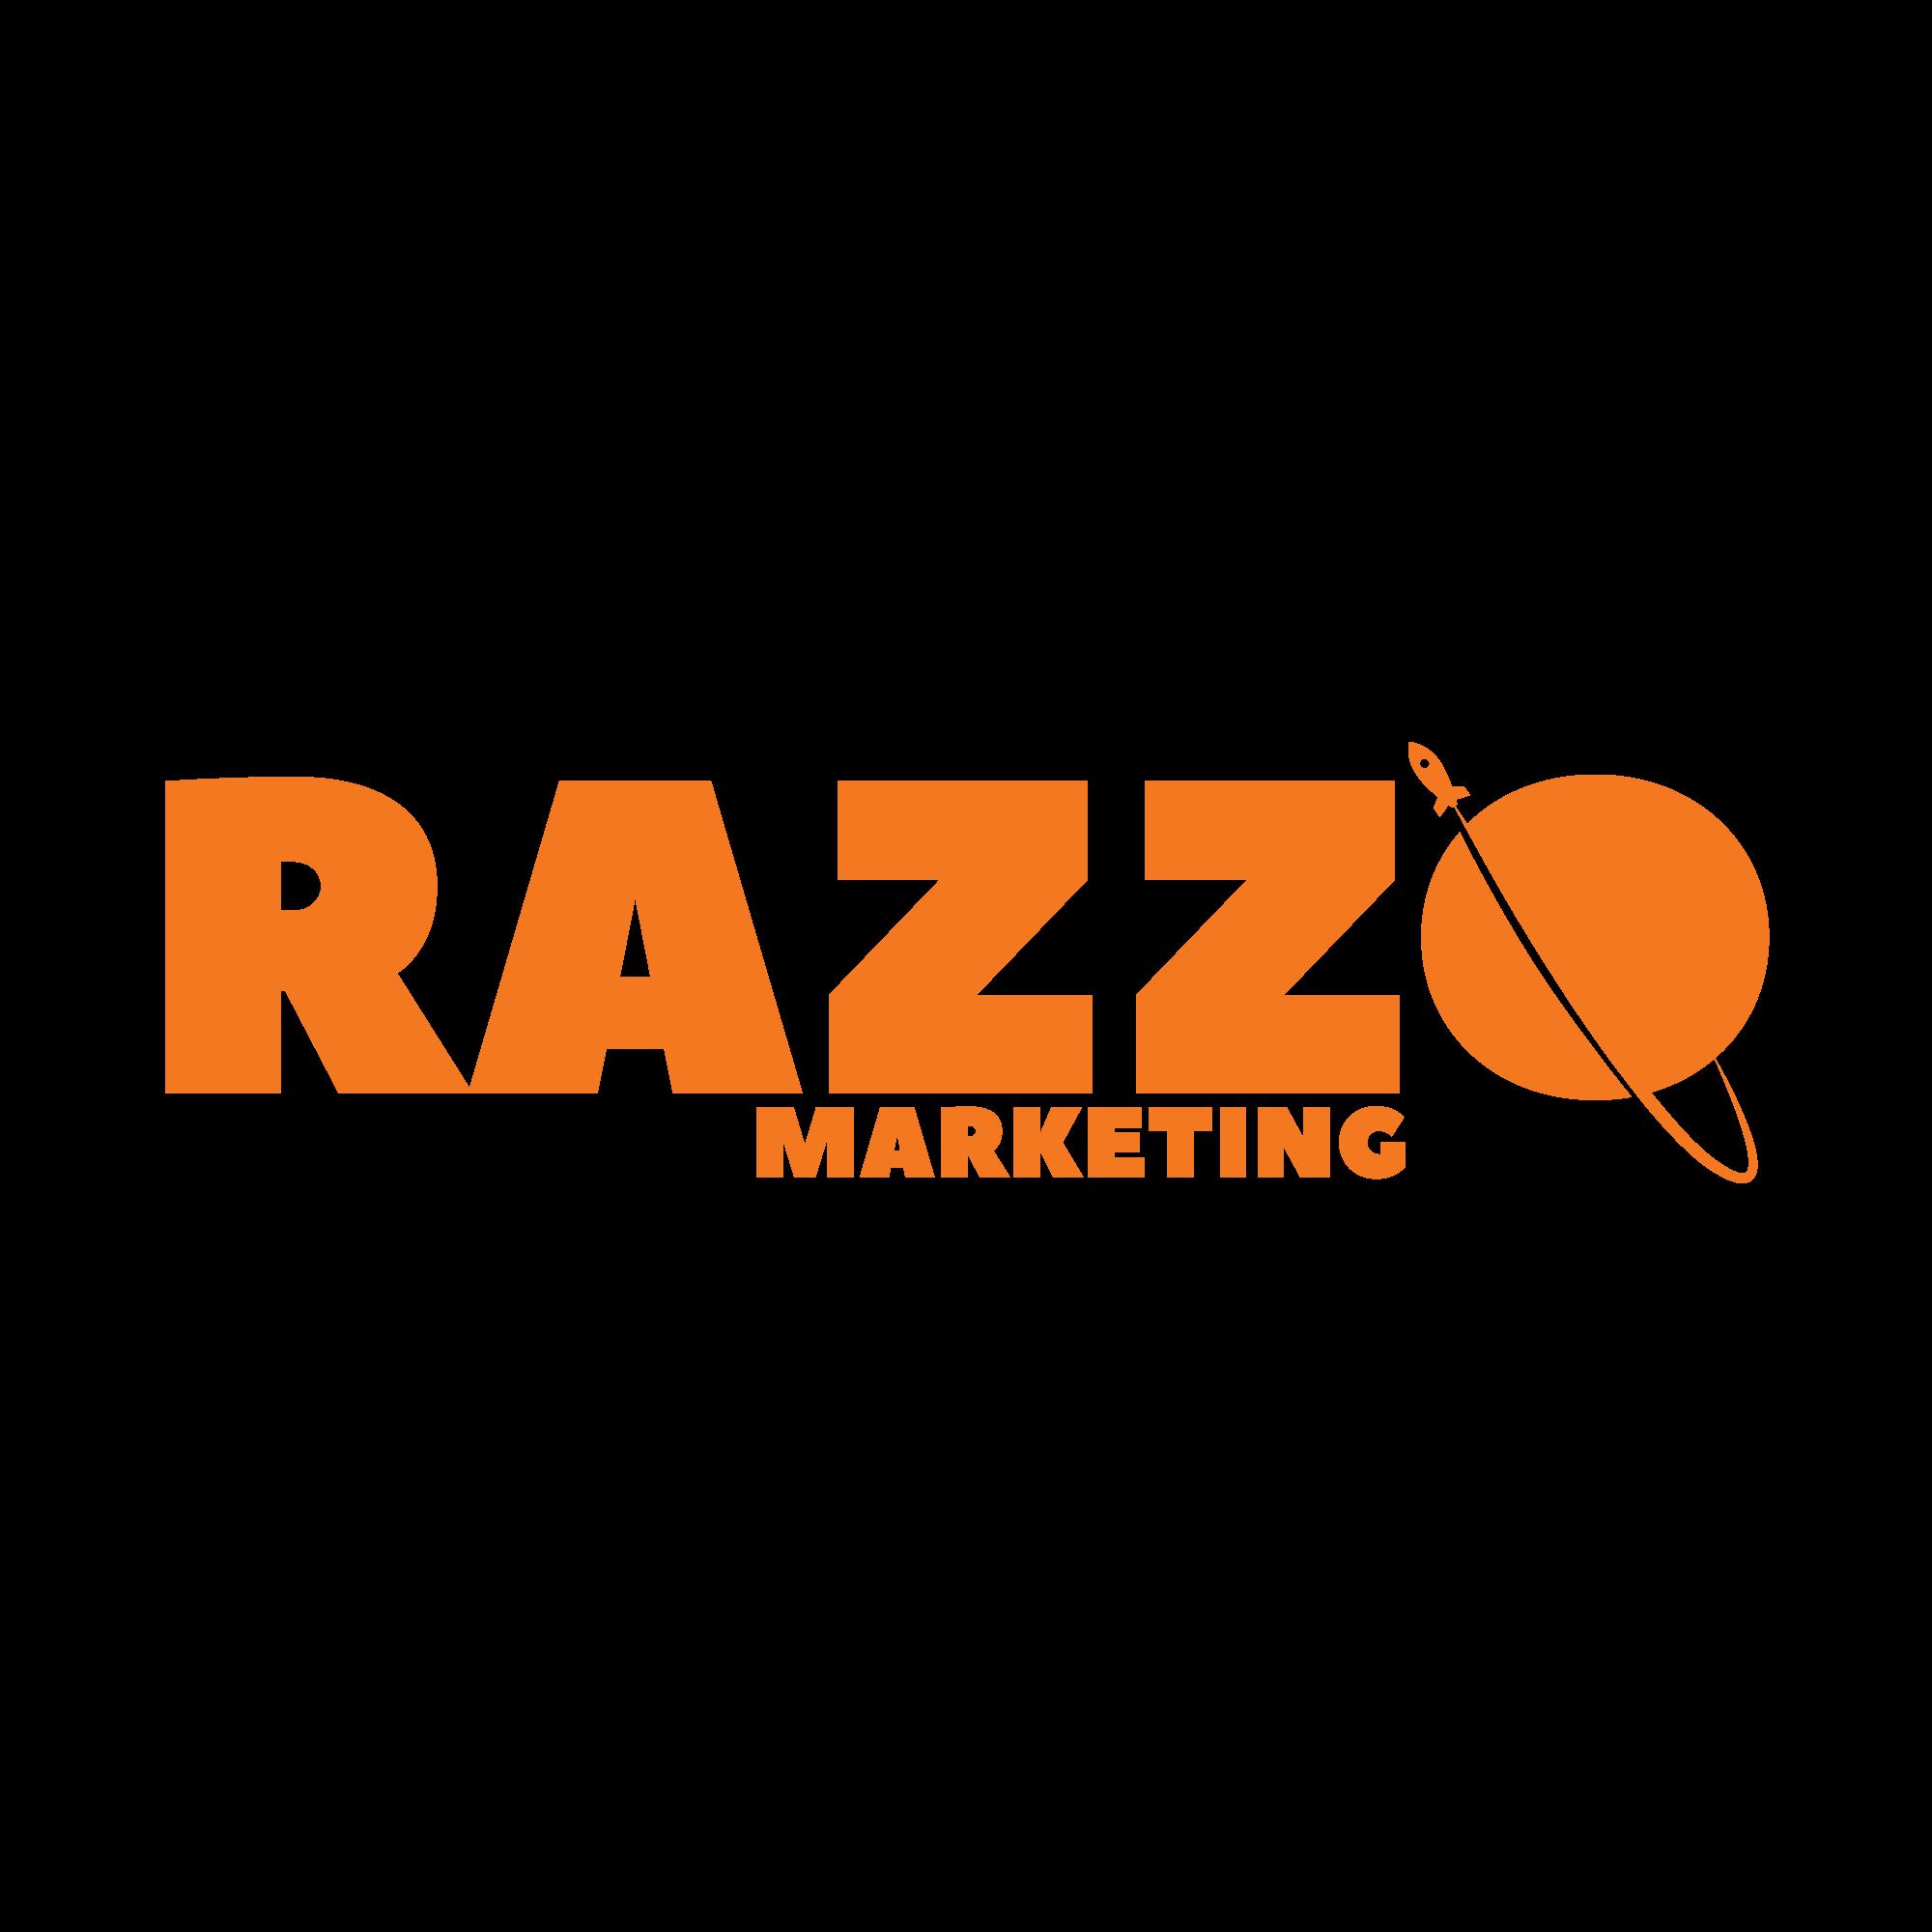 Razzo Marketing Group